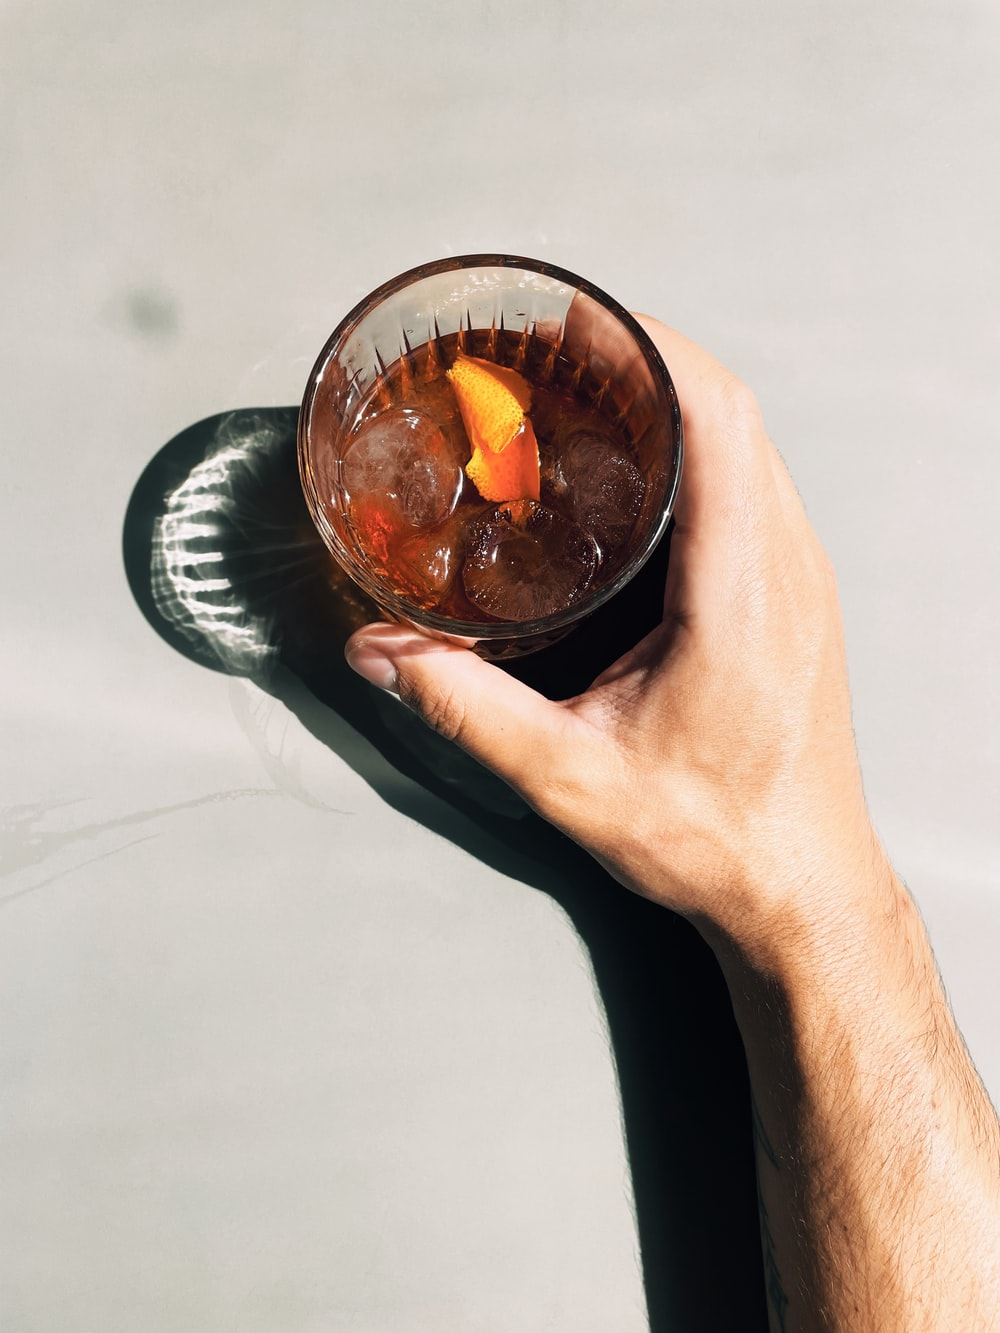 clear glass bowl with orange liquid